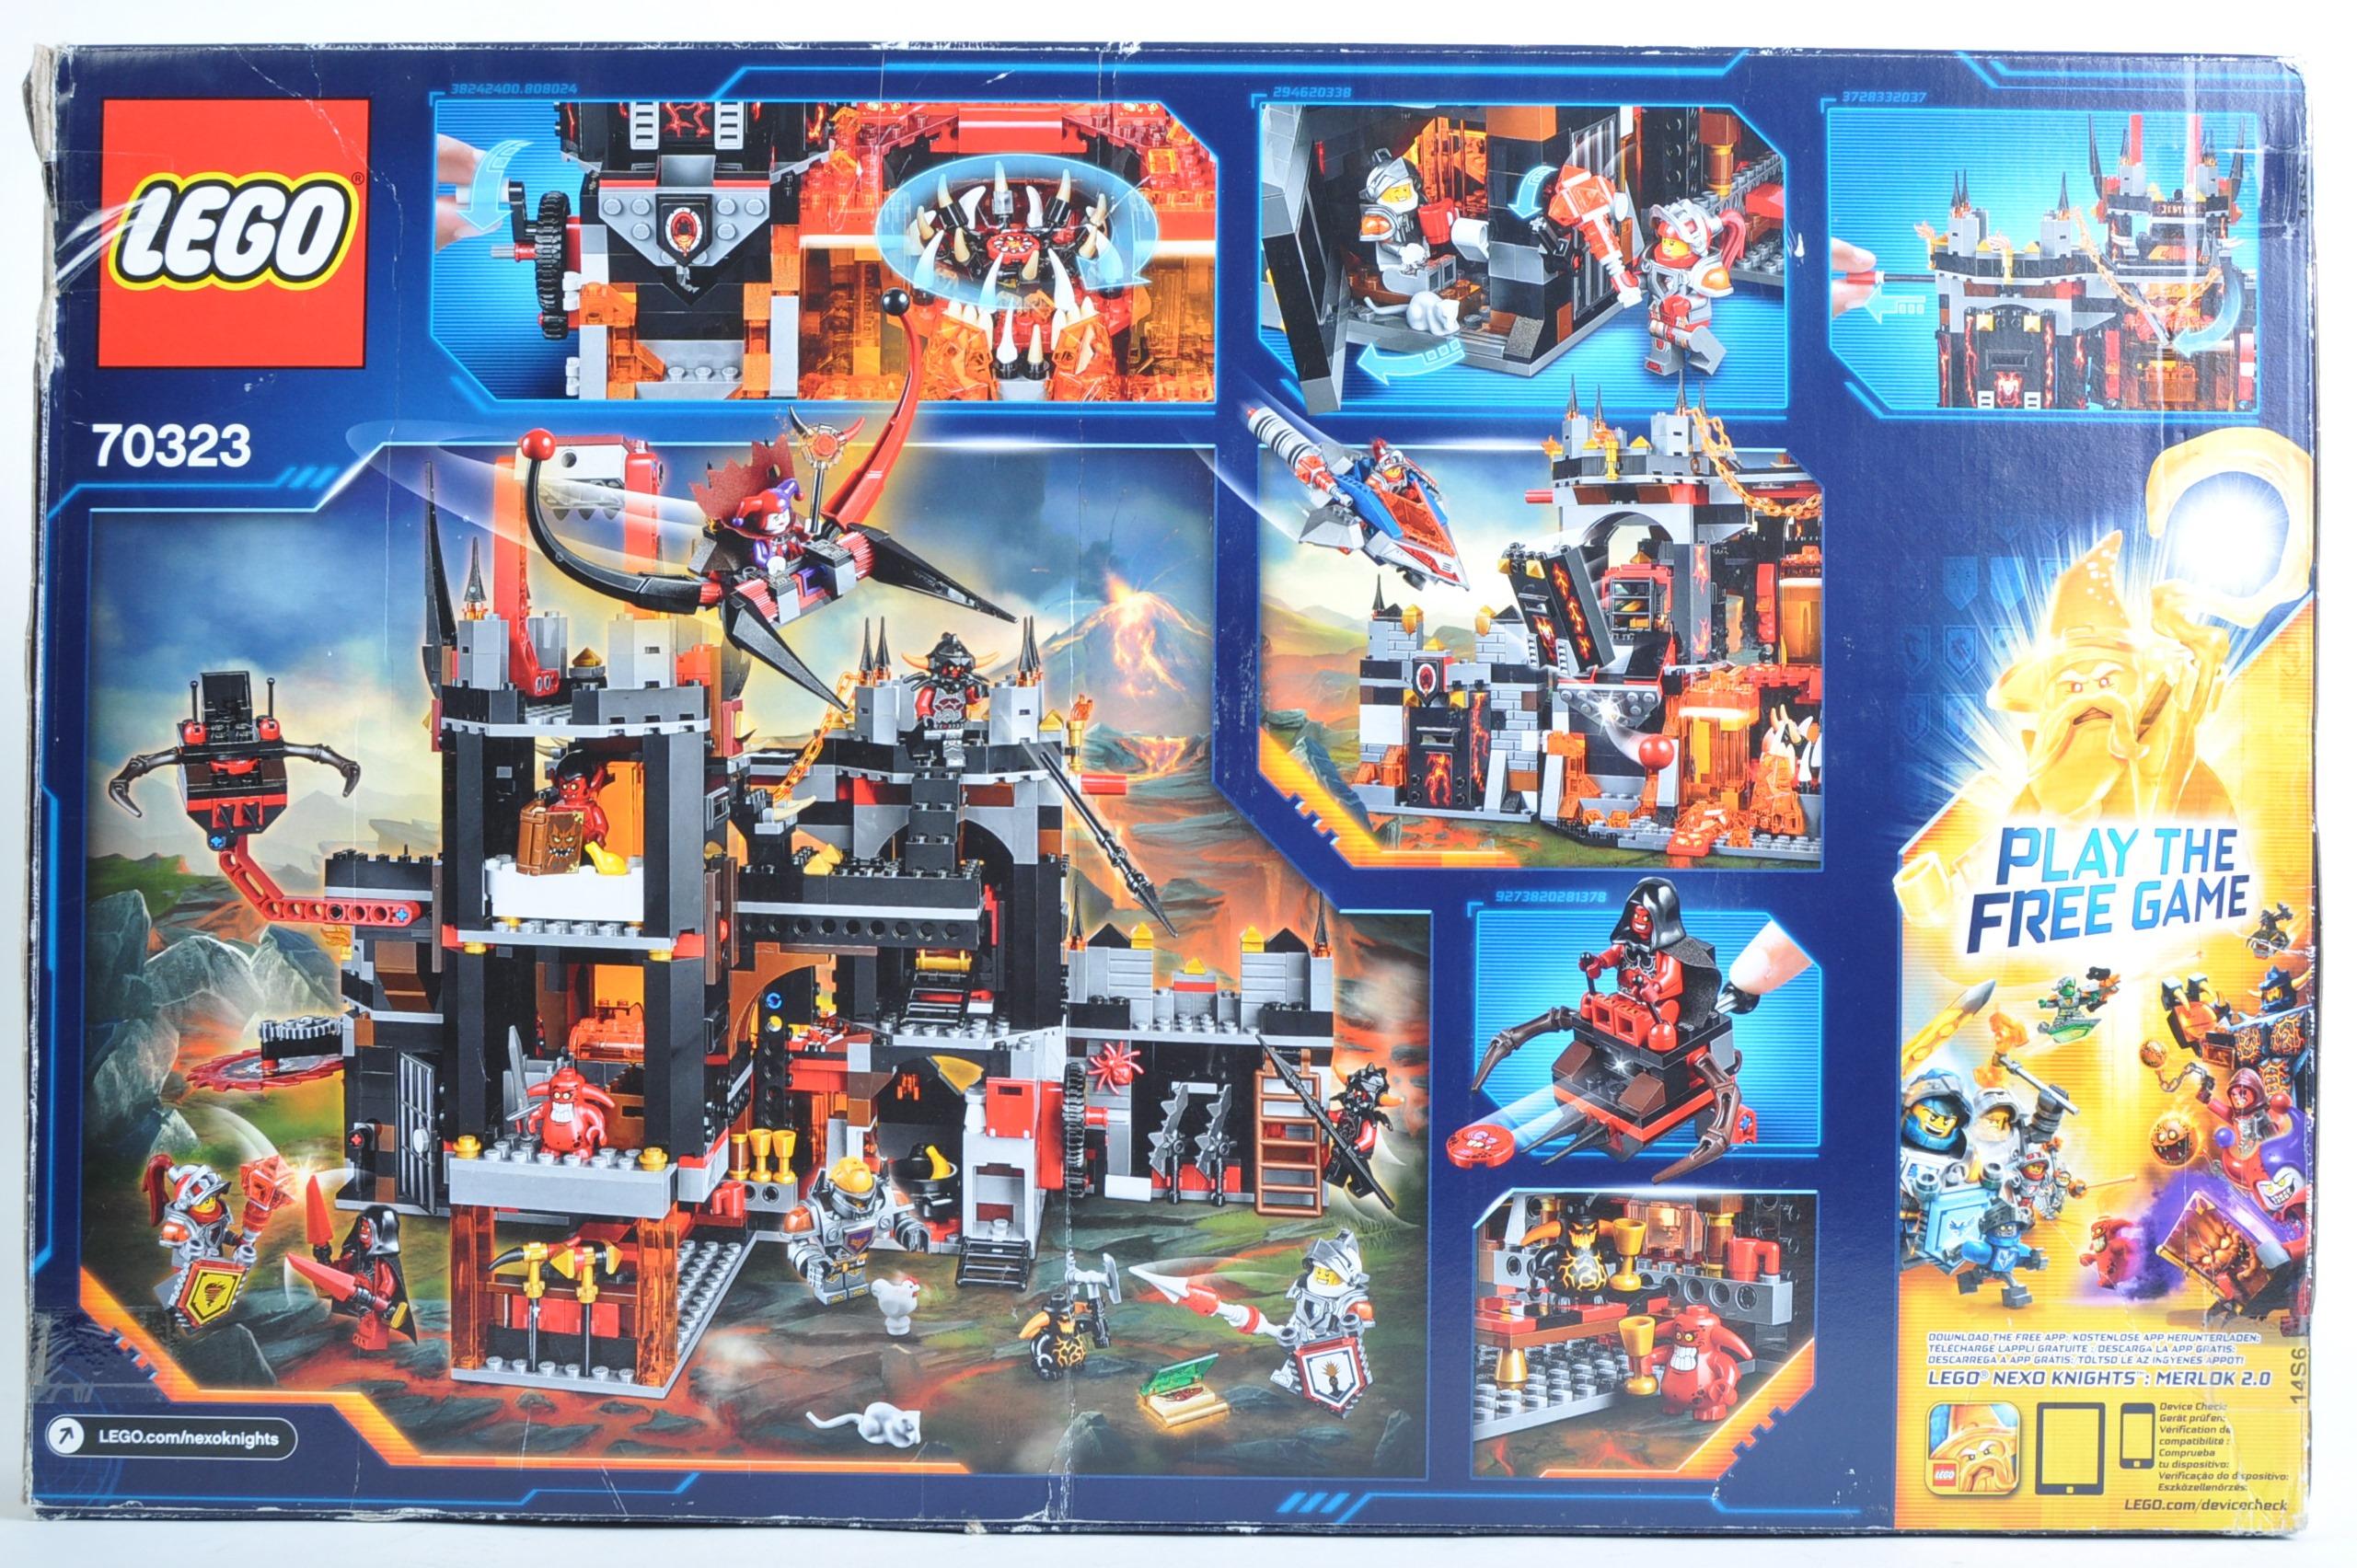 LEGO SET - NEXO KNIGHTS - 70323 JESTRO'S VOLCANO LAIR - Image 2 of 4